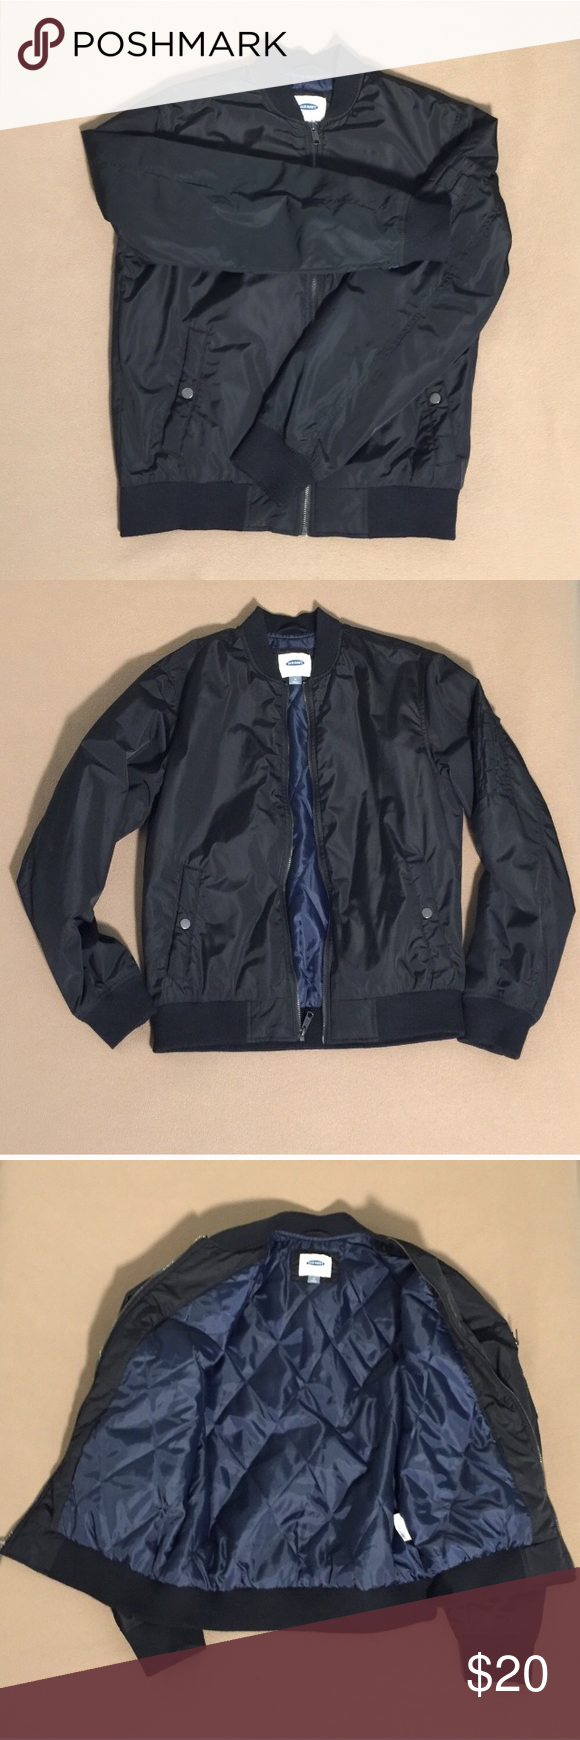 Men S Black Winter Bomber Jacket Bomber Jacket Winter Jackets Bomber Jacket [ 1740 x 580 Pixel ]